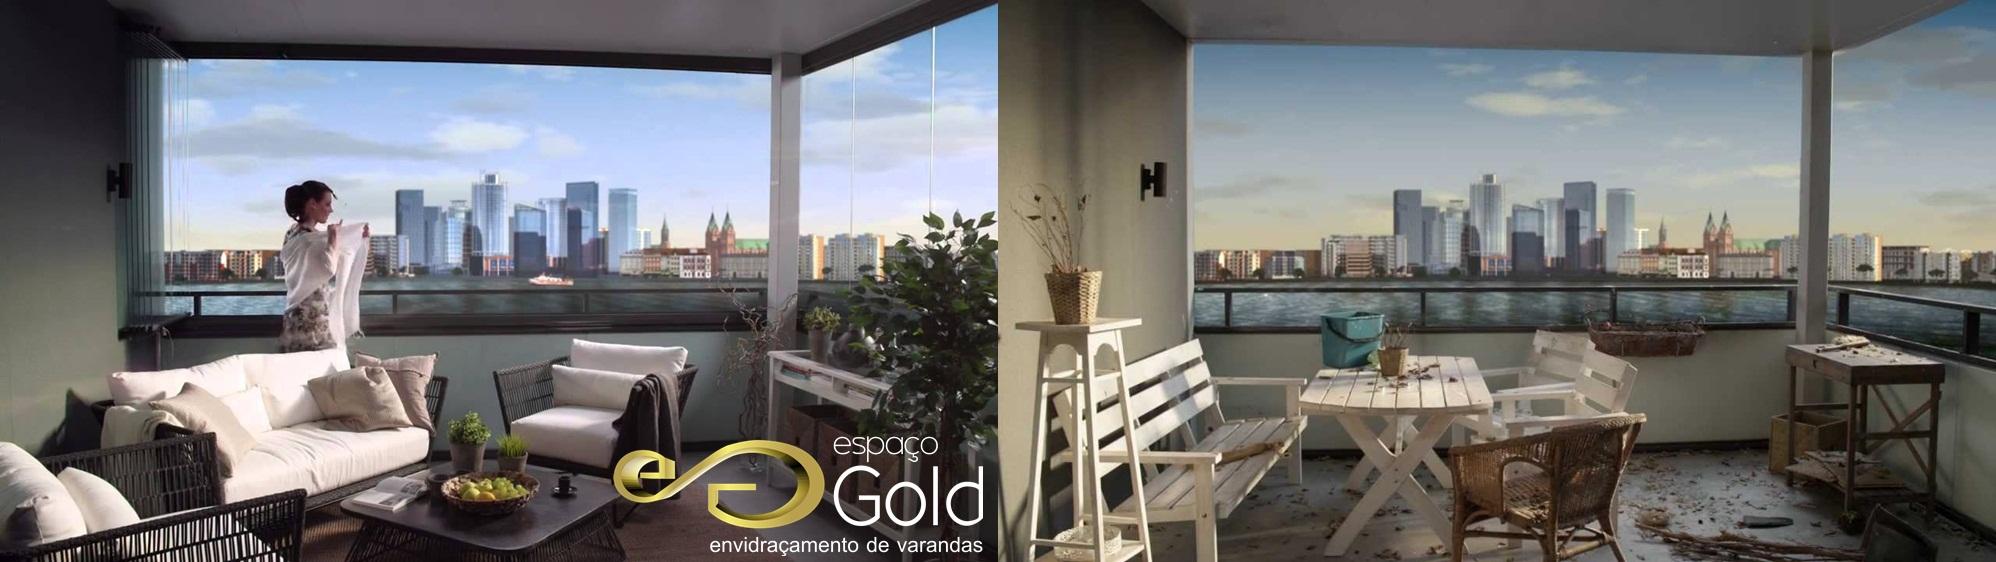 espaco-gold-01